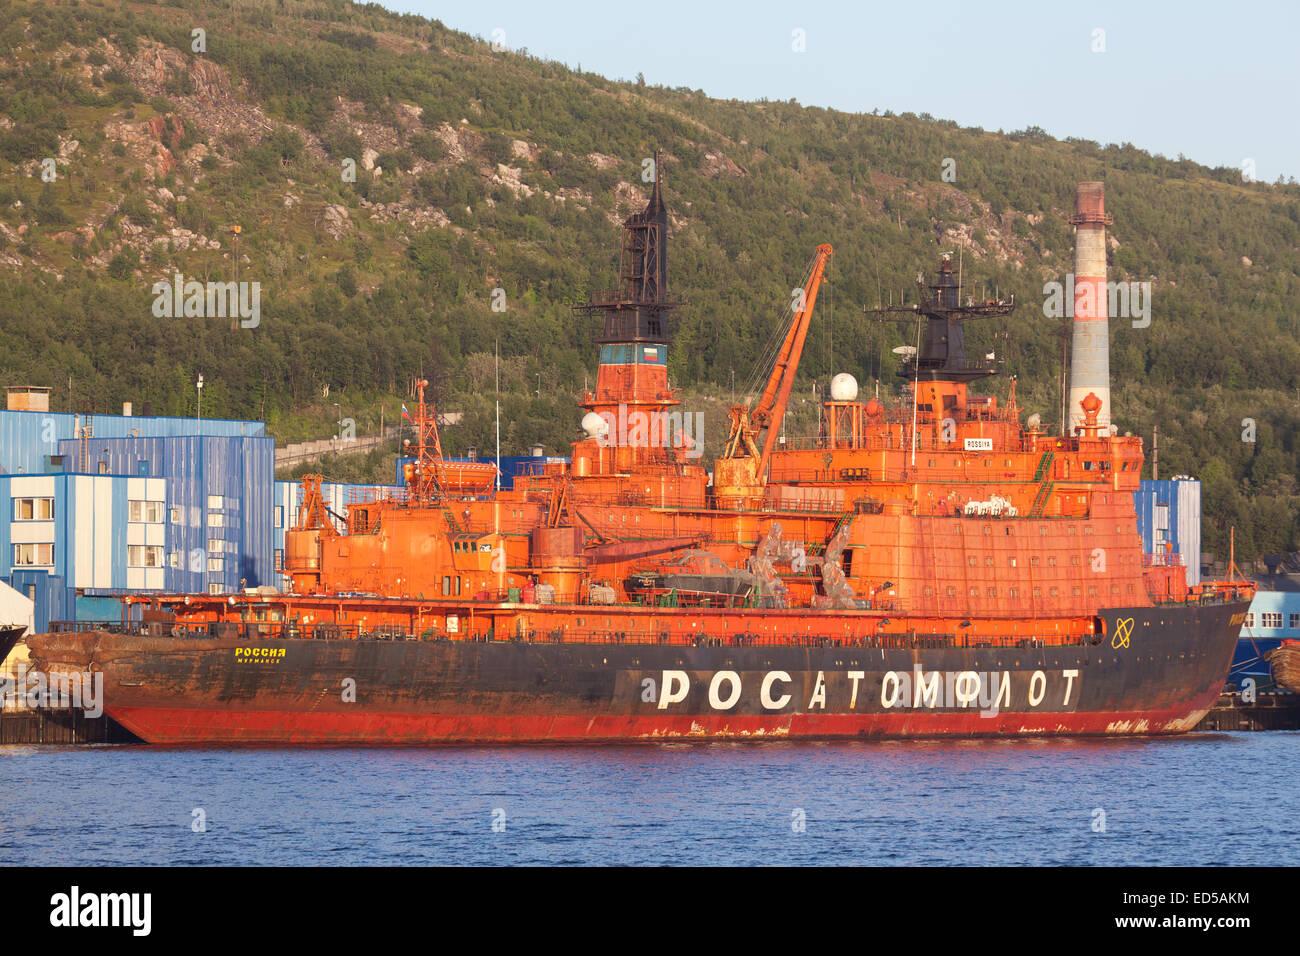 Nuclear-powered icebreaker 'Rossiya' - Stock Image